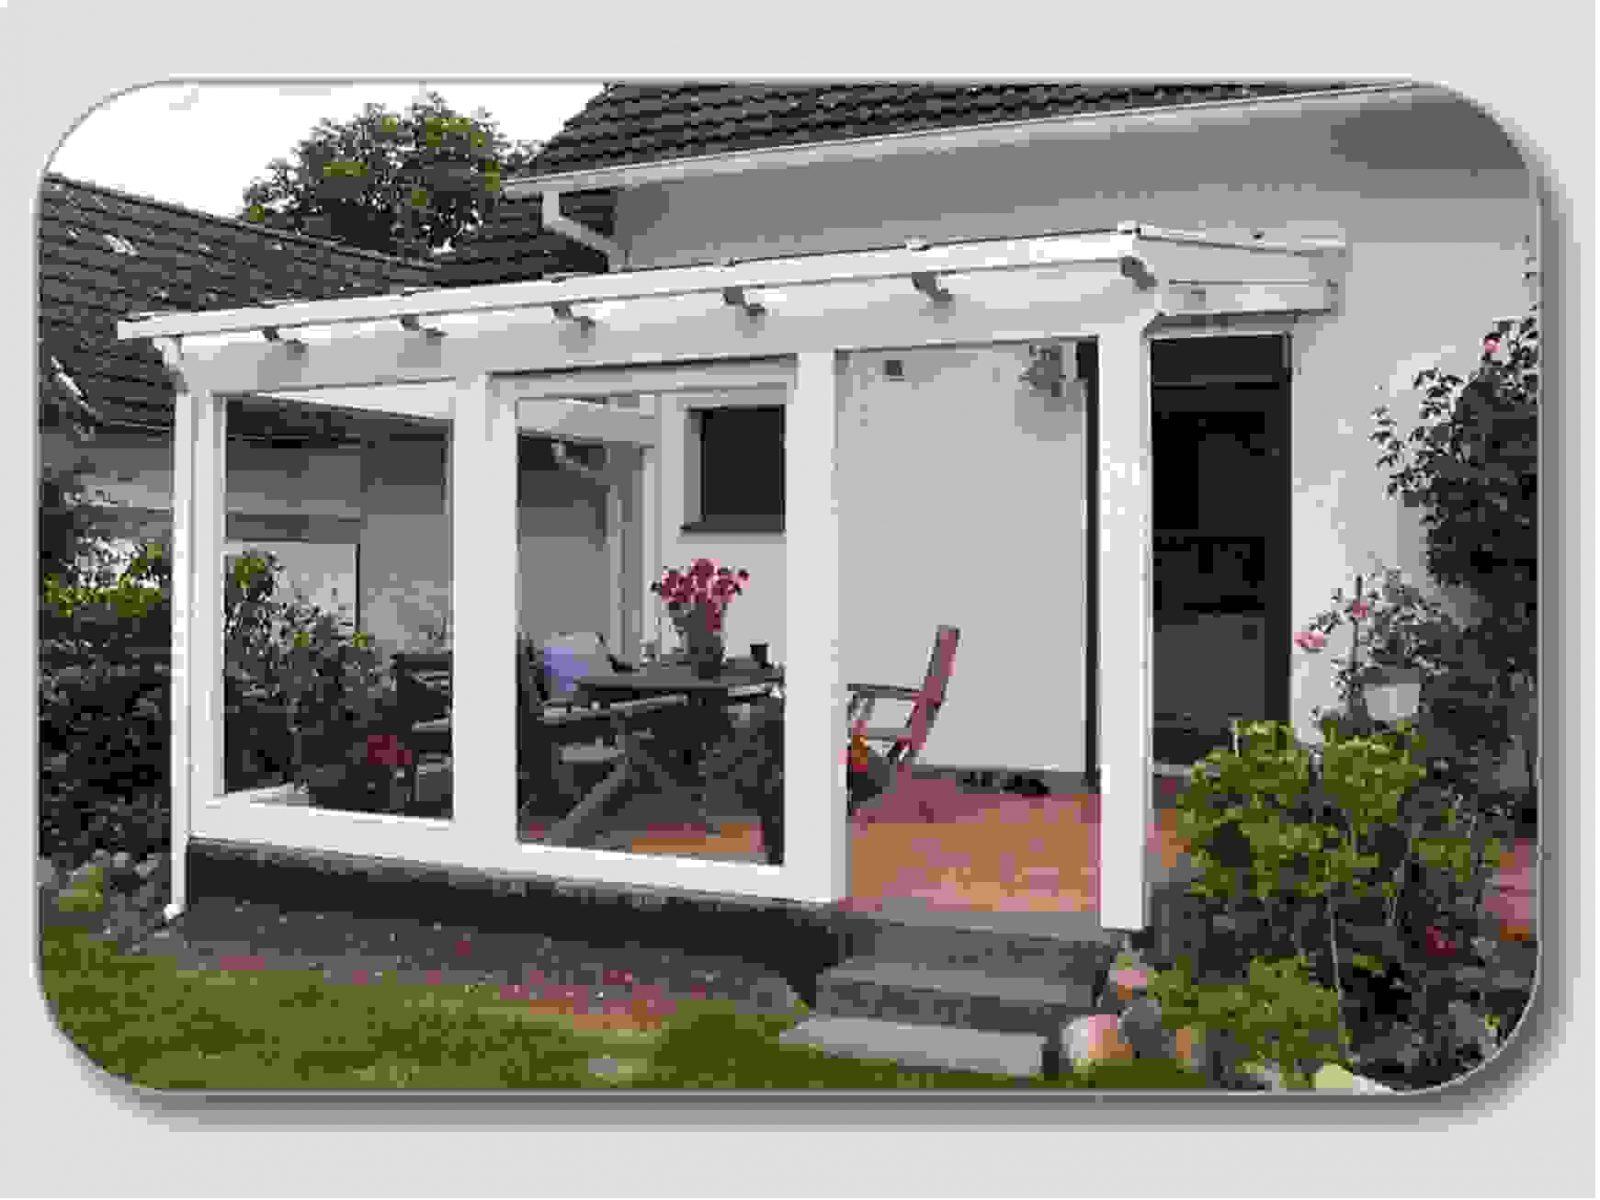 Genial Terrassenüberdachung Holz Bausatz Günstig Frisch Ist Frisch von Terrassenüberdachung Günstig Selber Bauen Bild